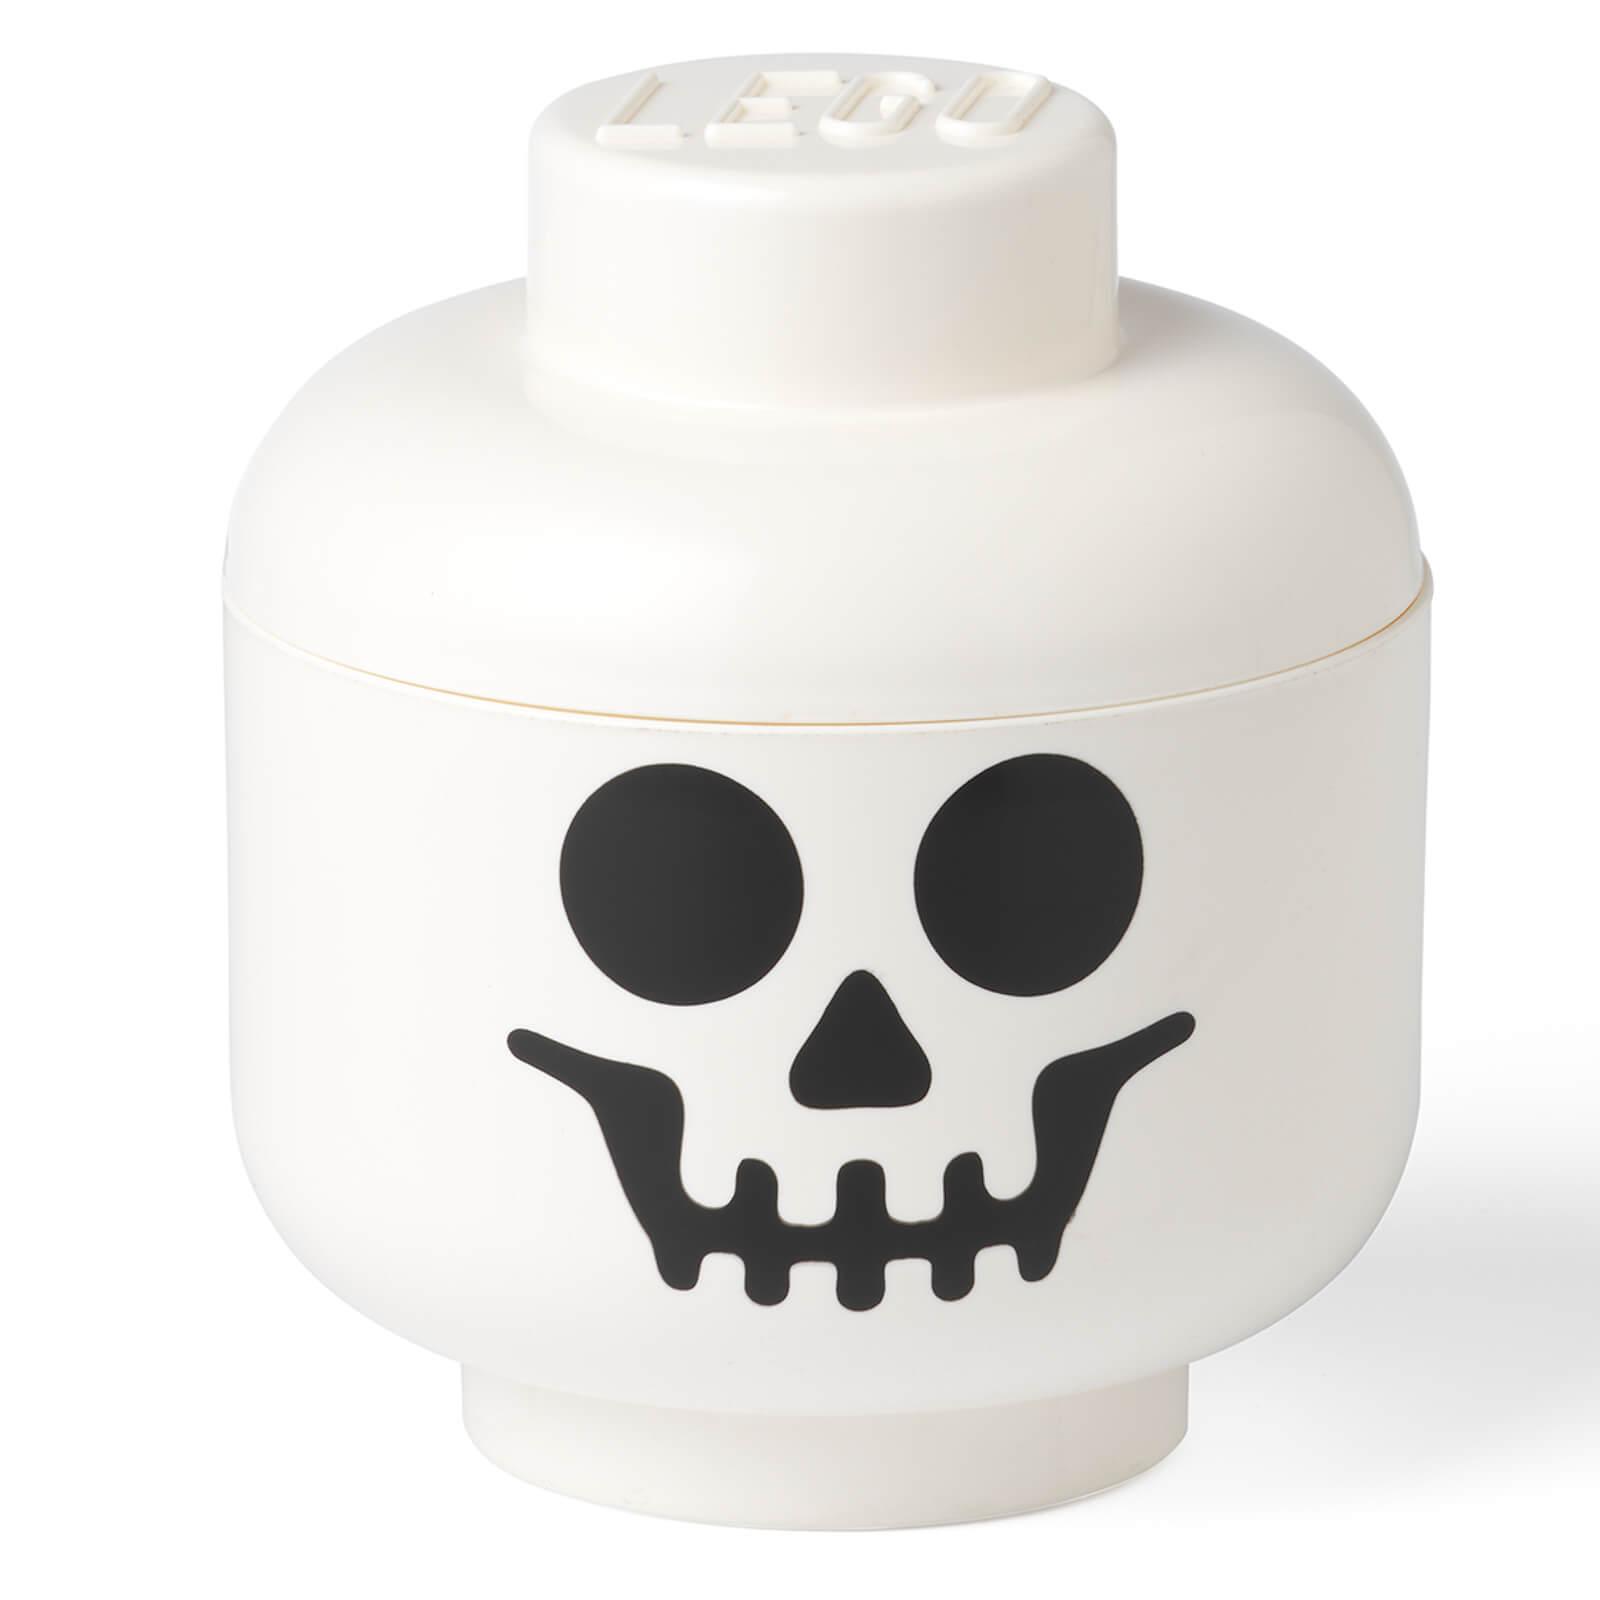 Image of LEGO Storage Skeleton Head - Small